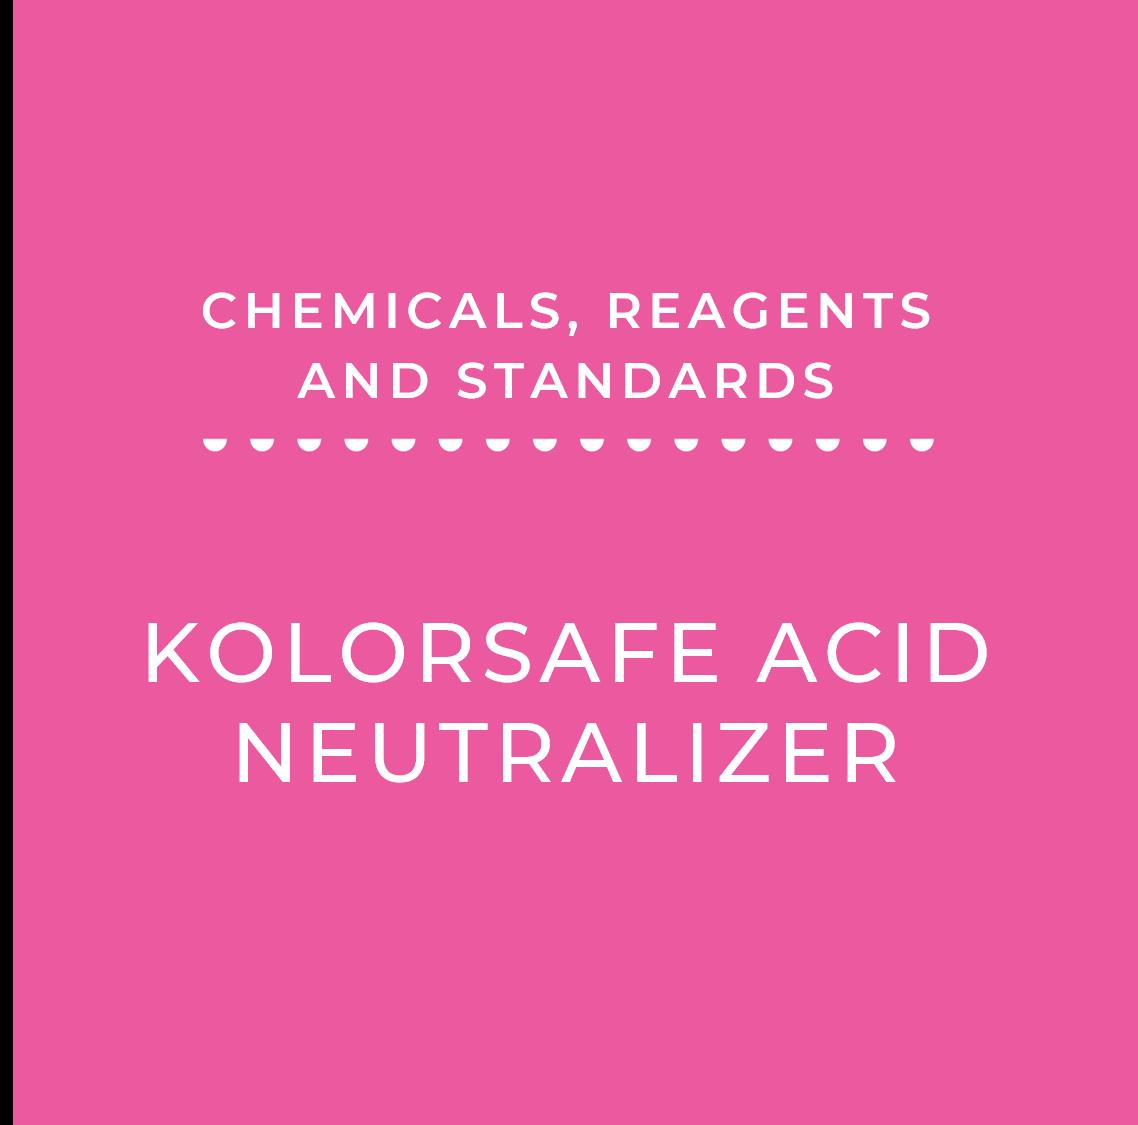 Kolorsafe Acid Neutralizer